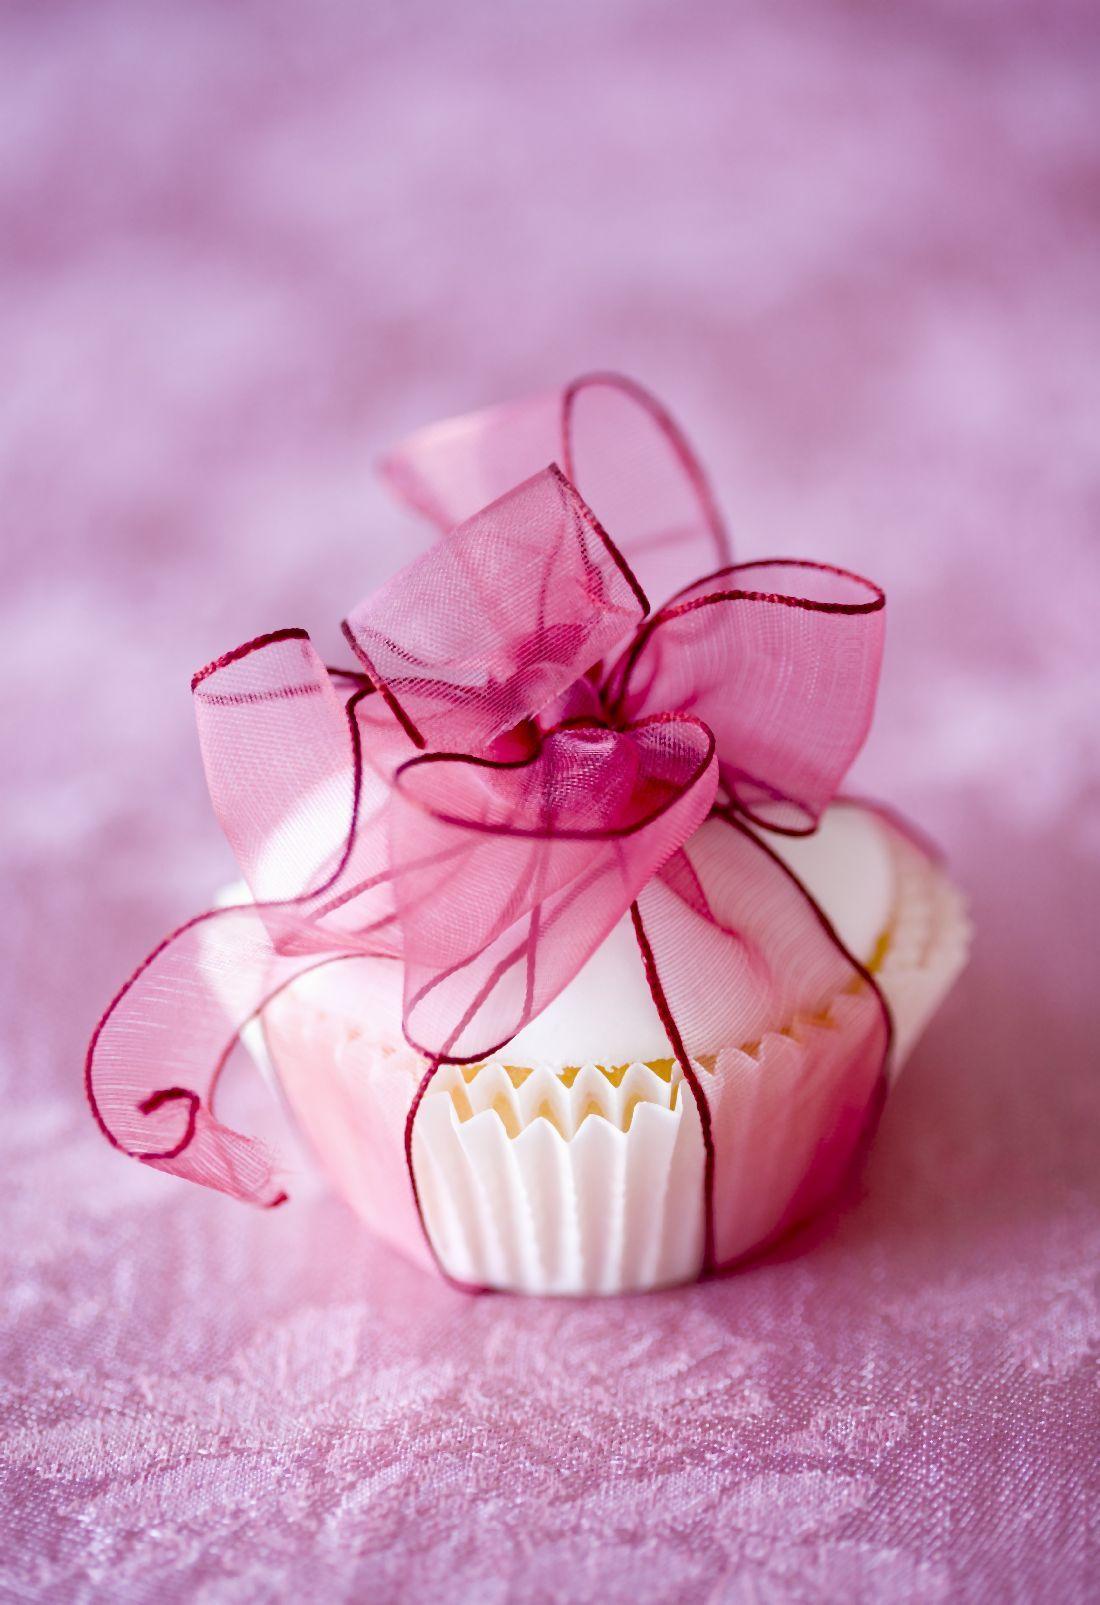 Fancy Mini Cake recipe | Eat Smarter USA